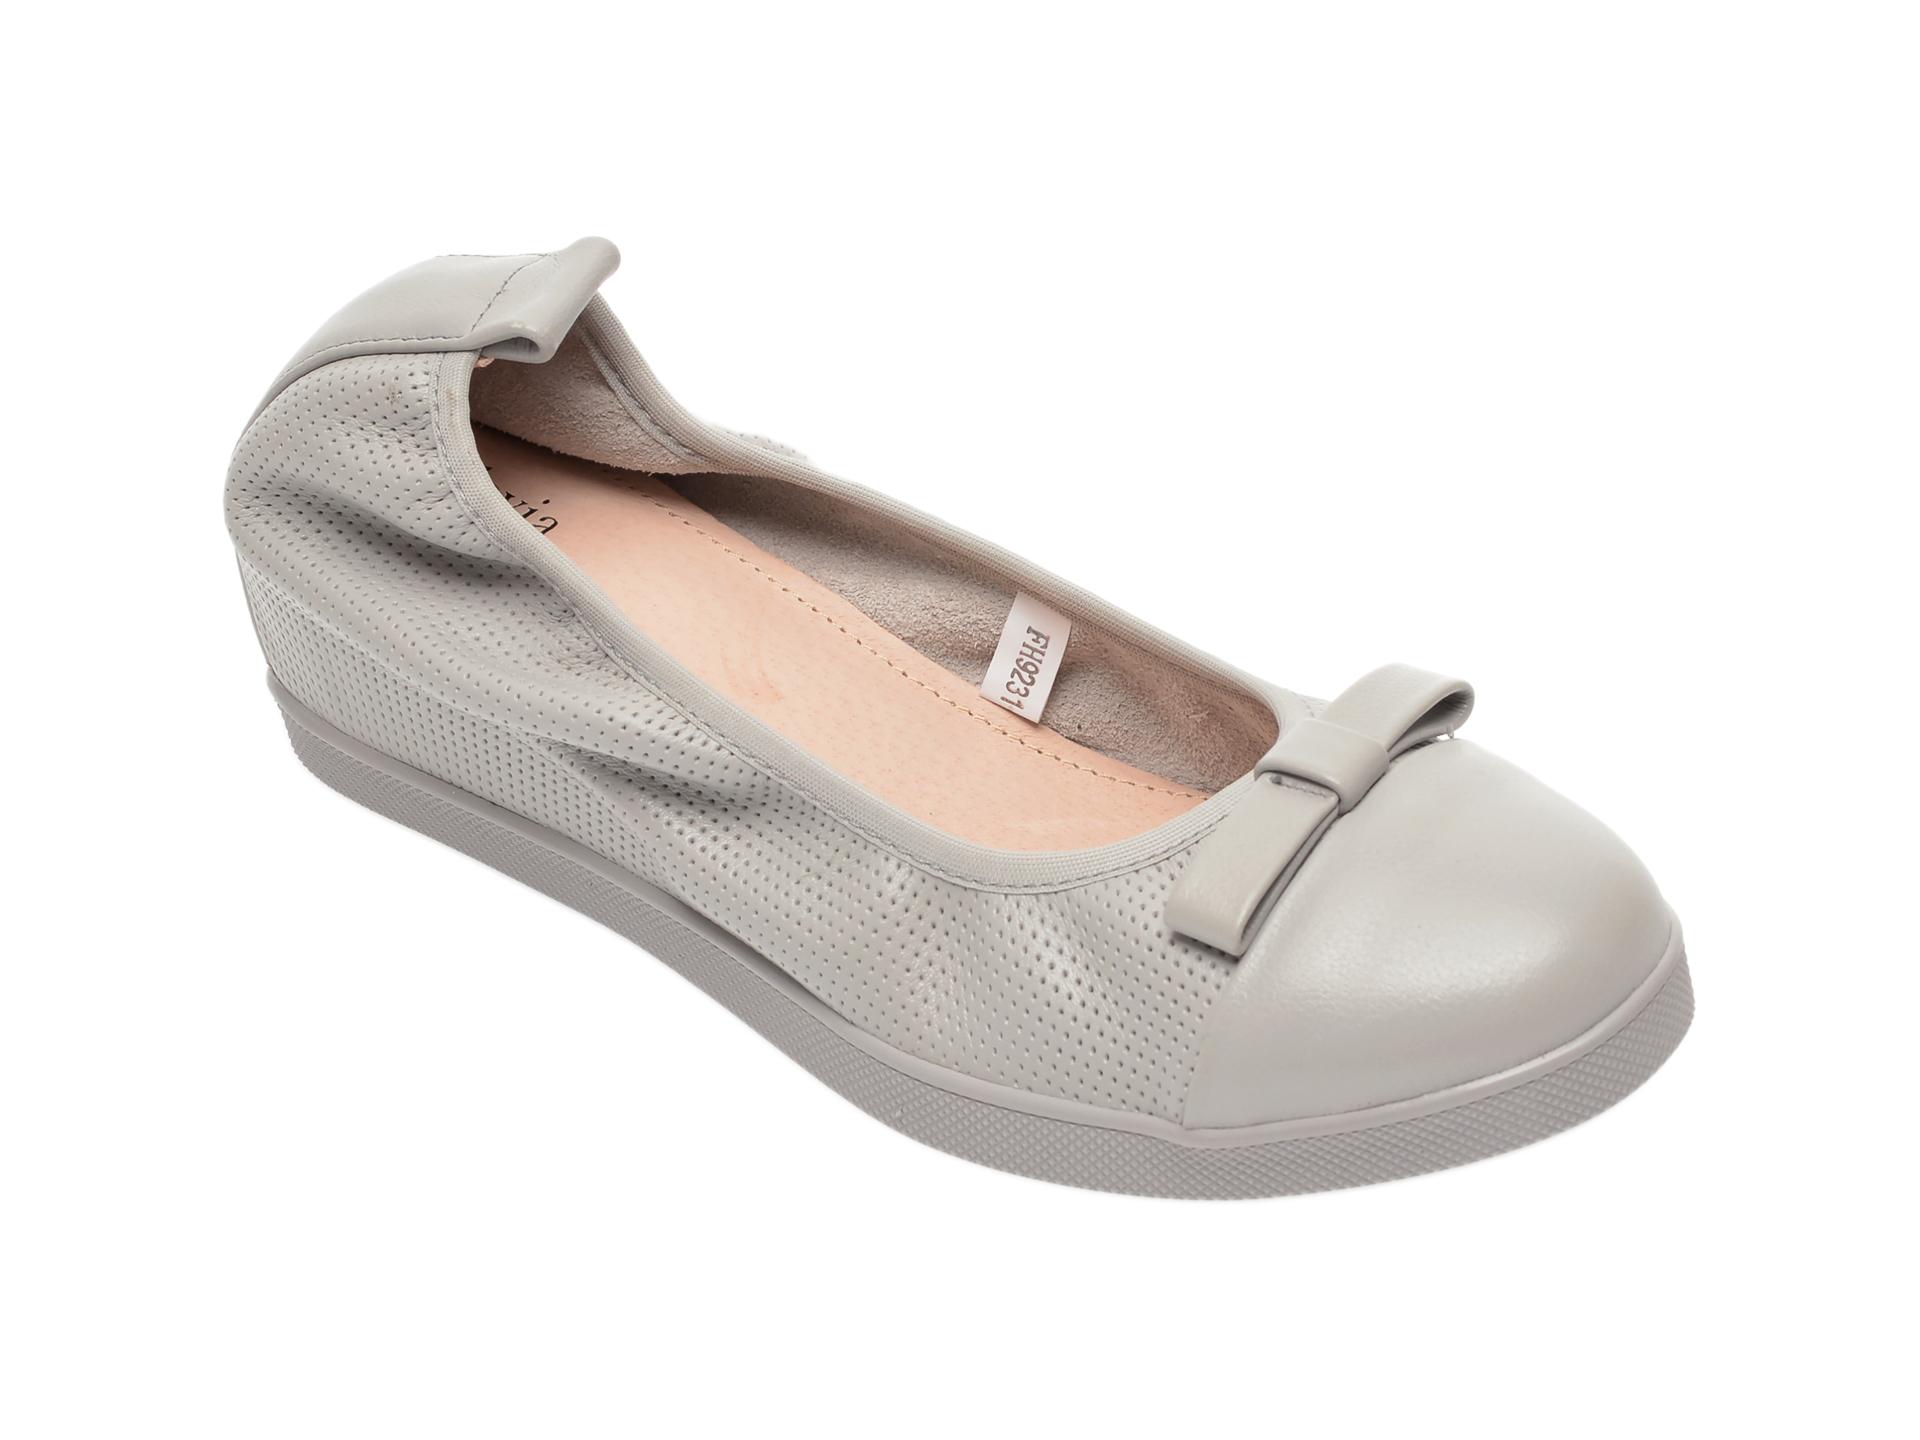 Pantofi FLAVIA PASSINI gri, FH92317, din piele naturala imagine